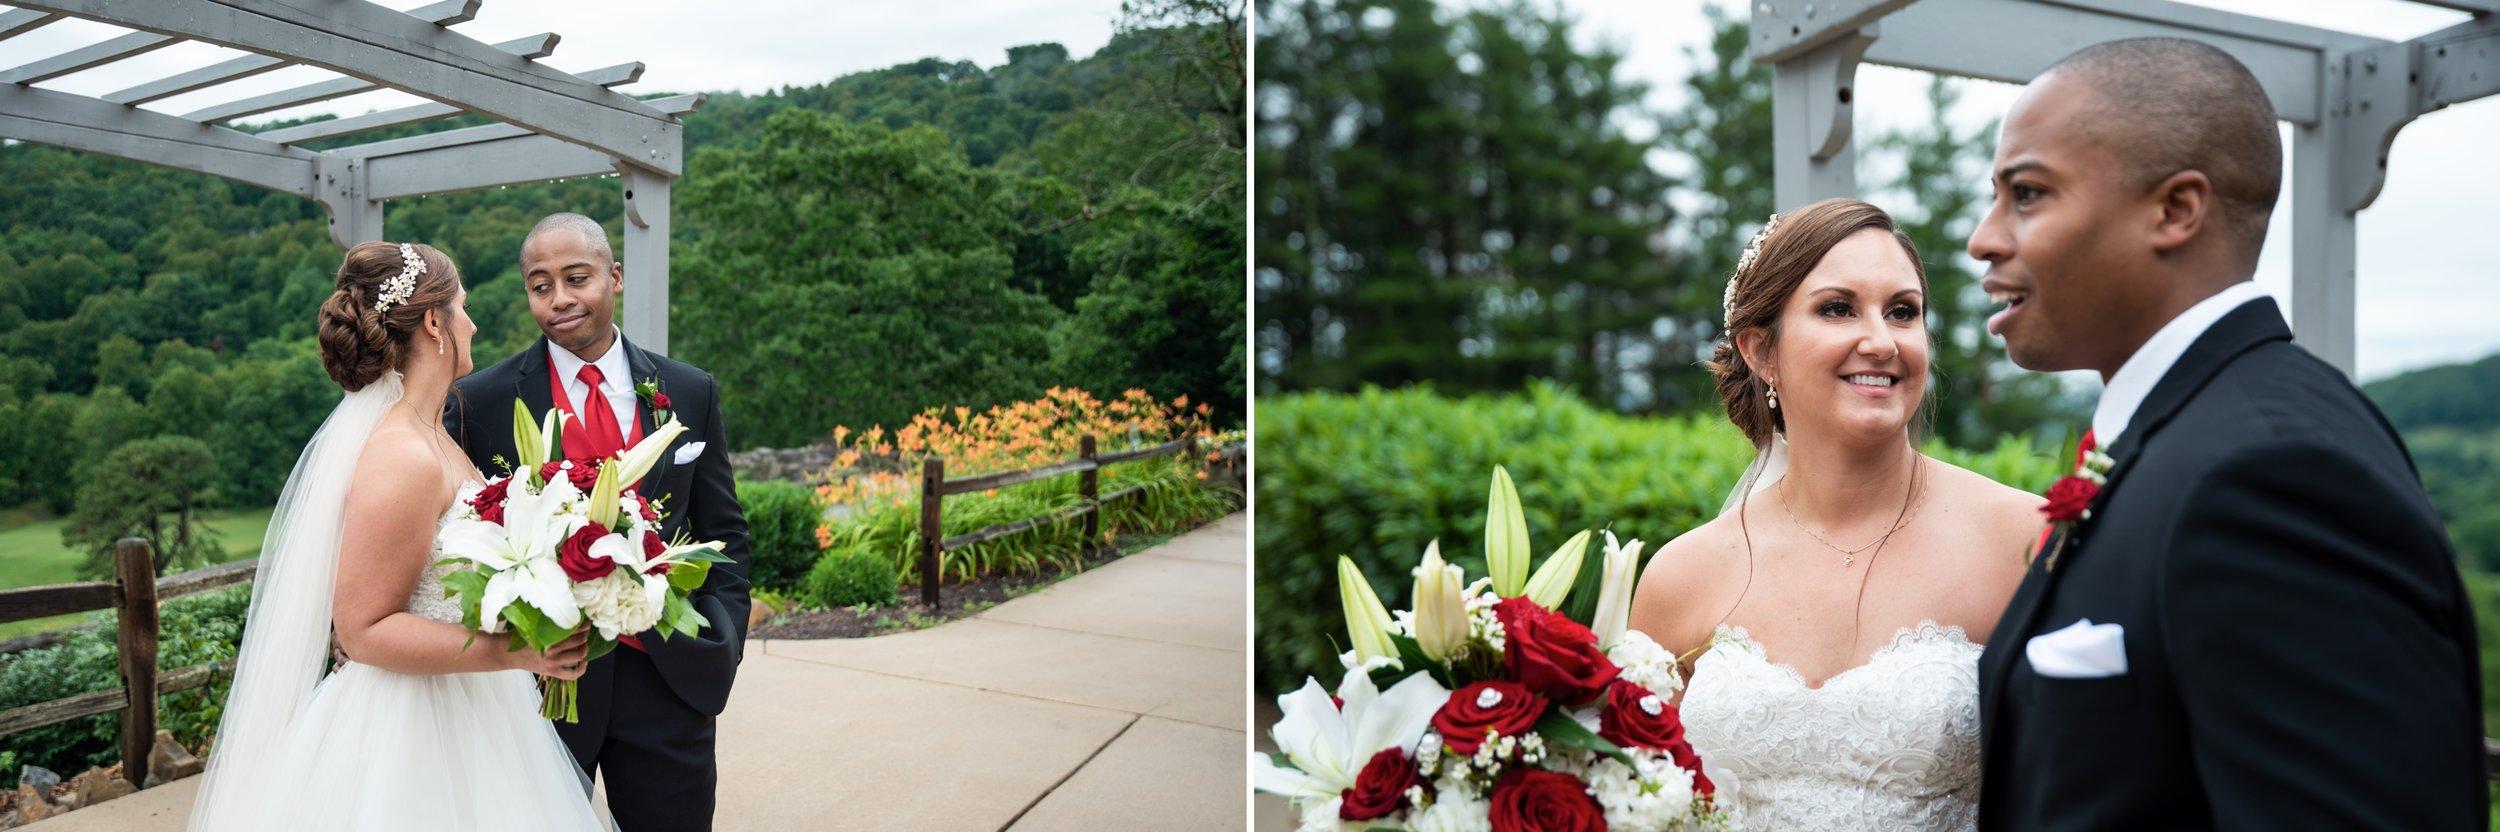 High Vista Weddings - Asheville Wedding 2 29.jpg